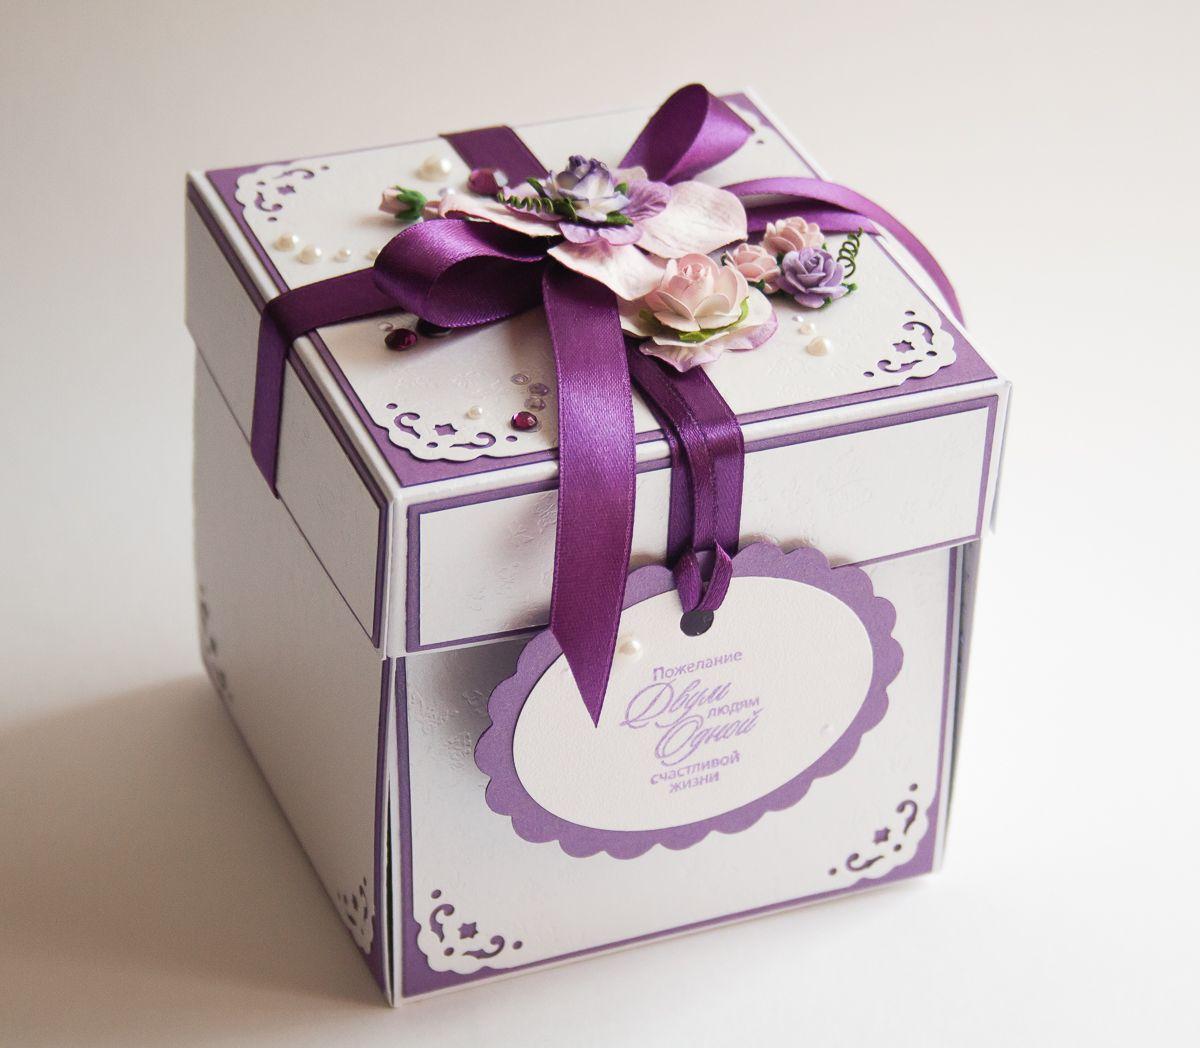 коробочки для подарков скрапбукинг фото произошло